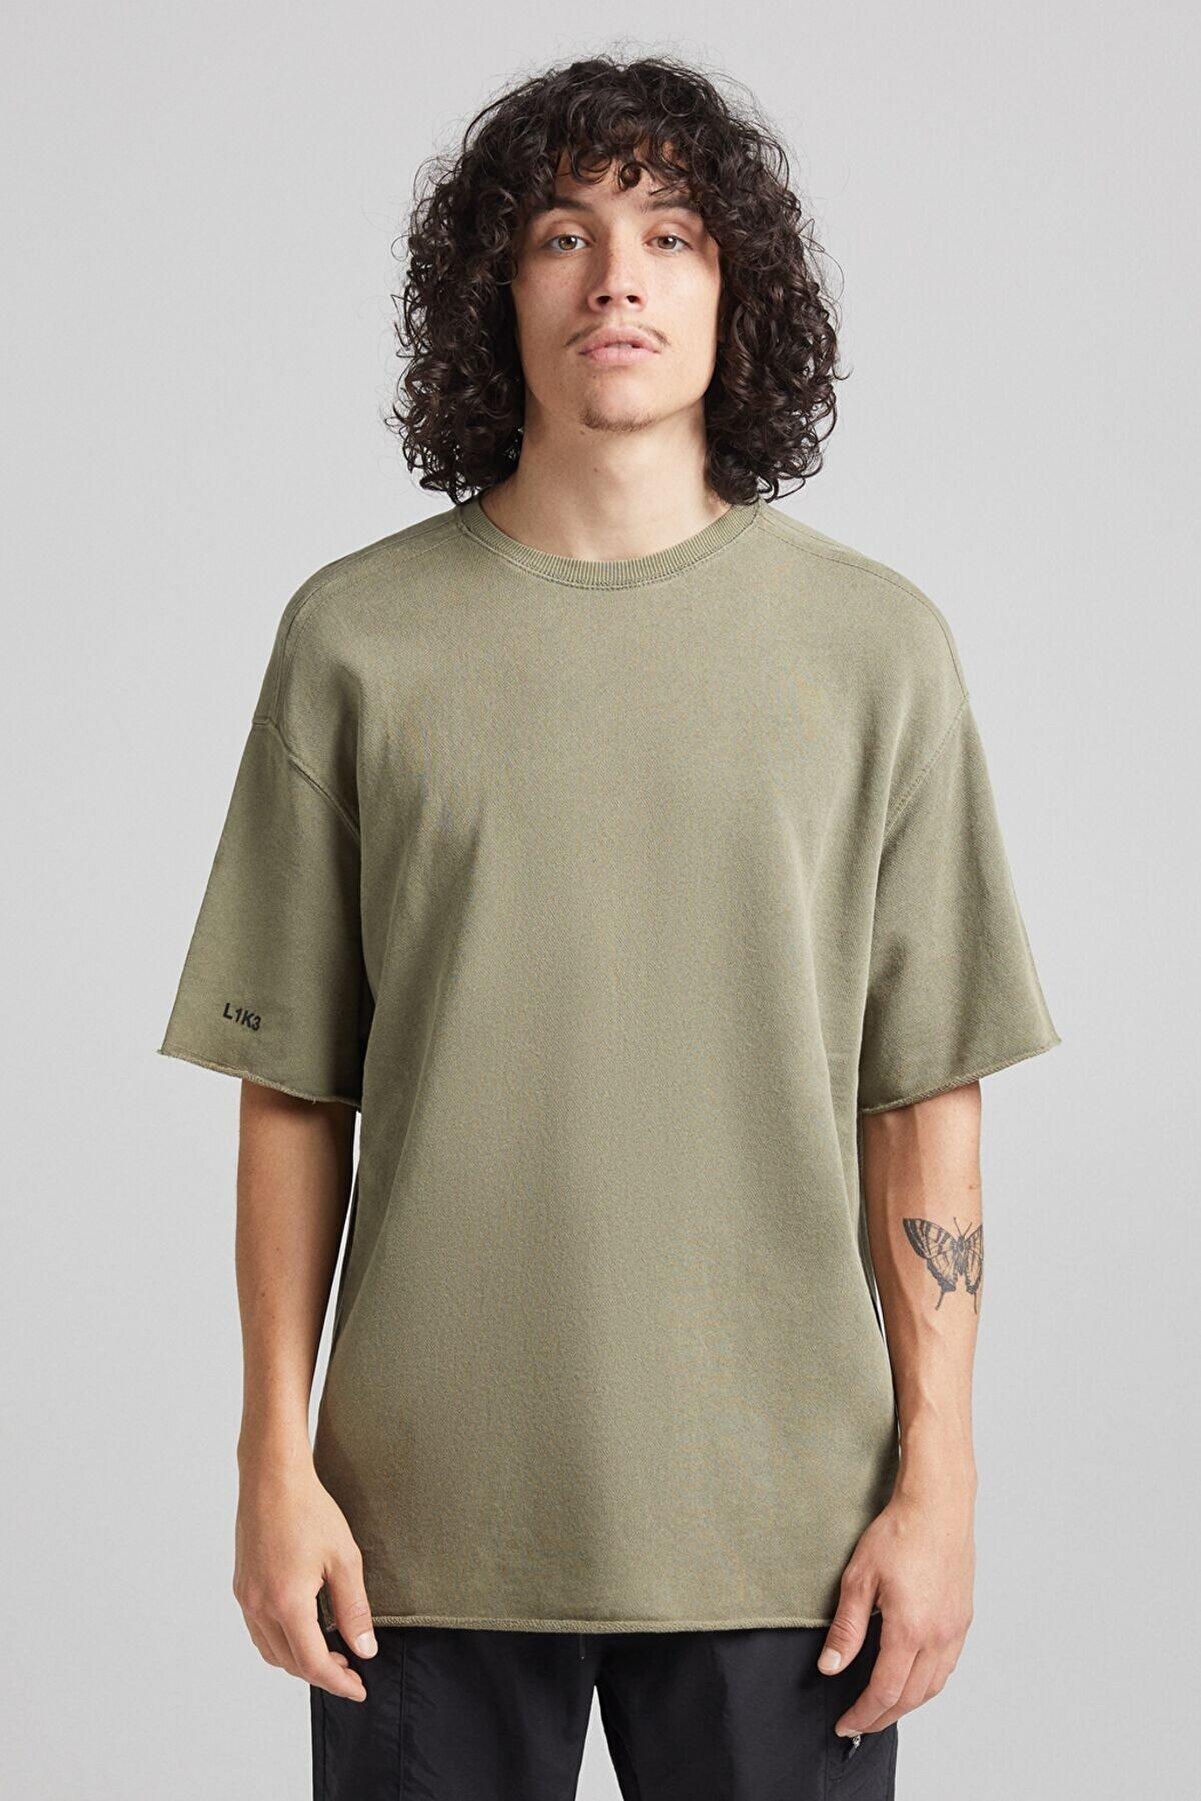 Bershka Erkek Haki Kısa Kollu Koton T-Shirt